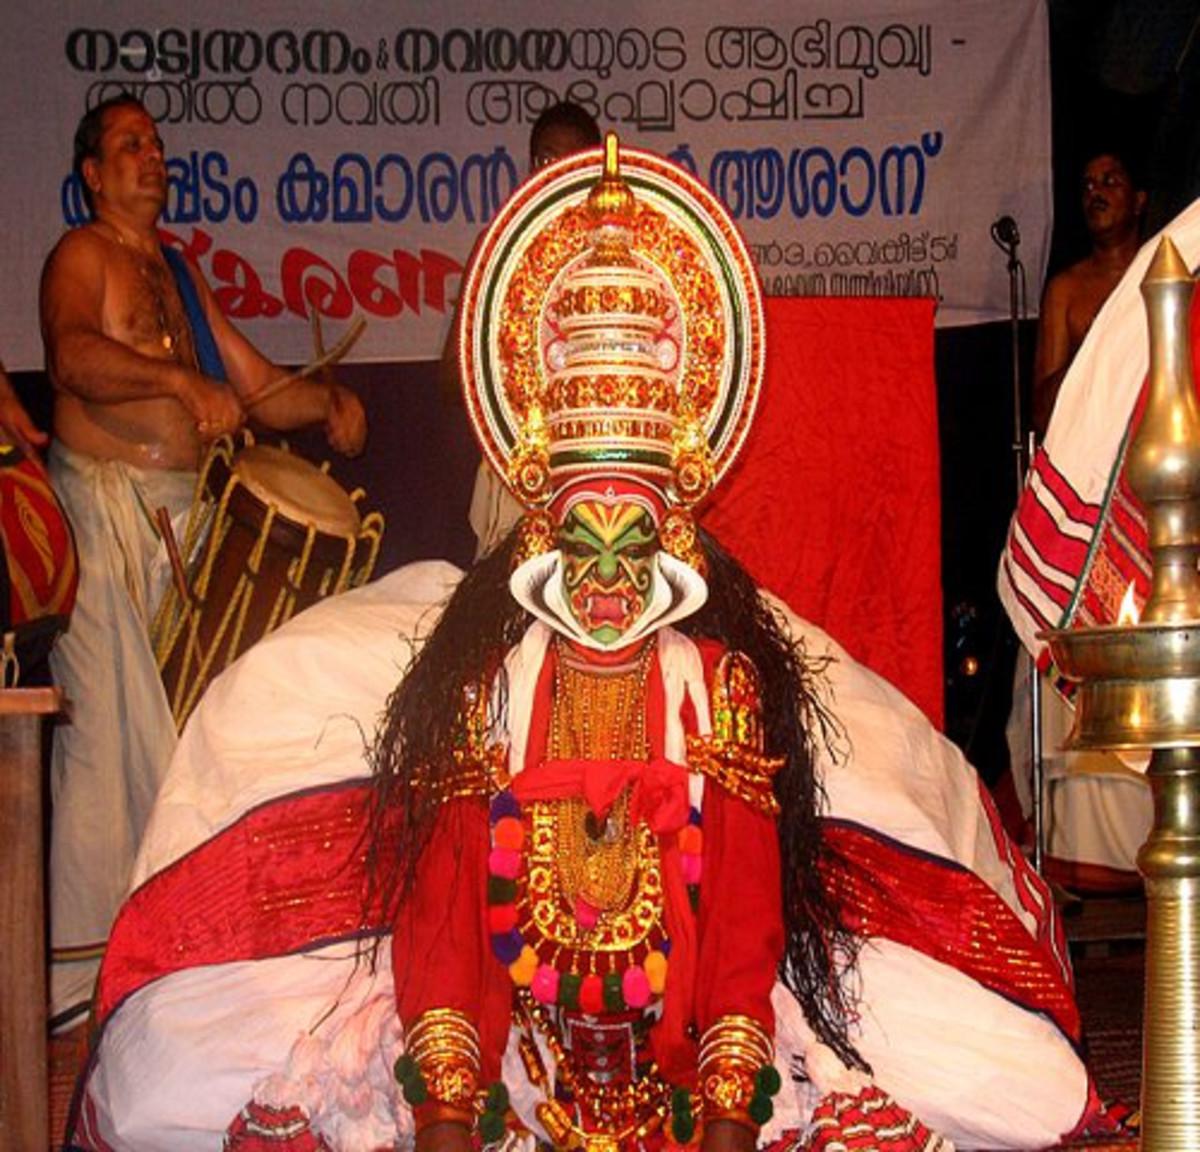 Sadanam_Krishnankutty as Raudra_Bheem in Duryodhanavadham